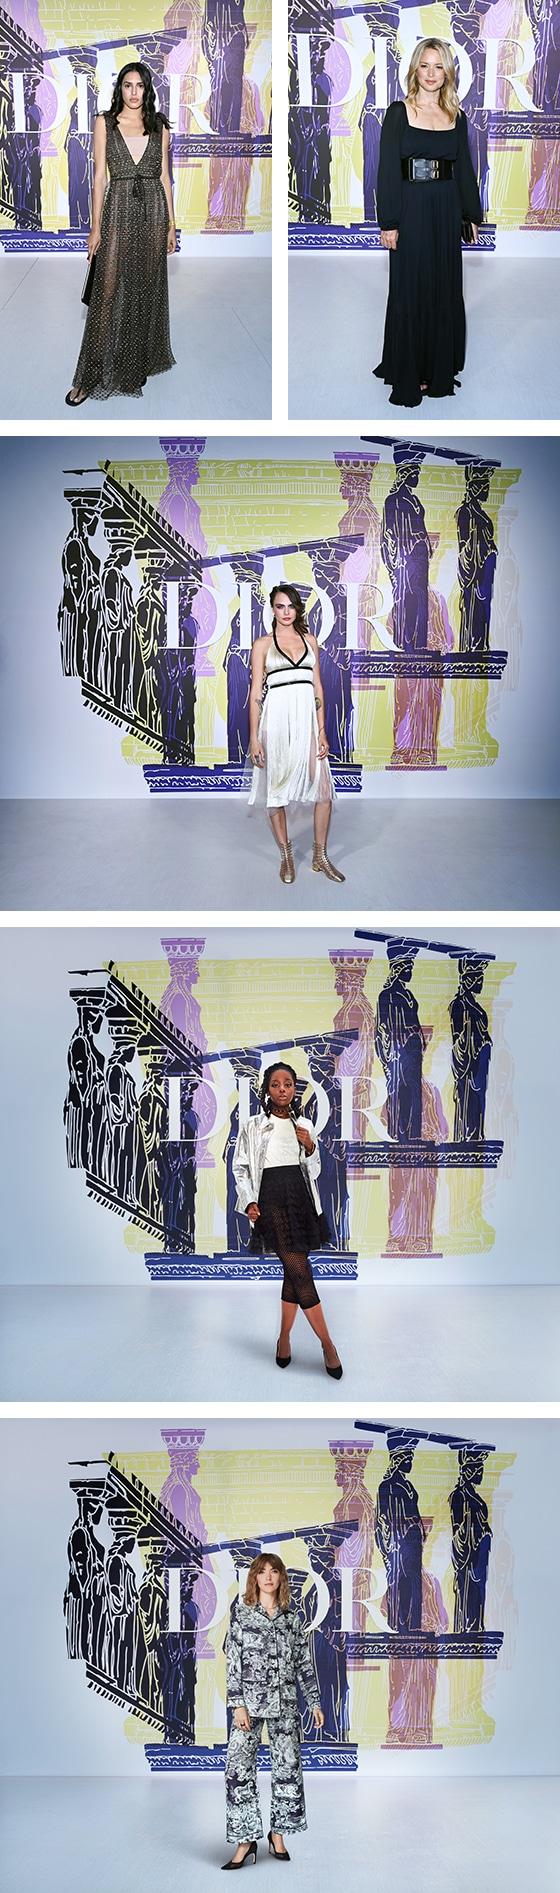 Croisiere_Dior_2022_VIP_Athina-Koini_Virginie-Efira_Cara-Delevingne_Thuso-Mbedu_Arizona-Muse_Courtesy_DIOR